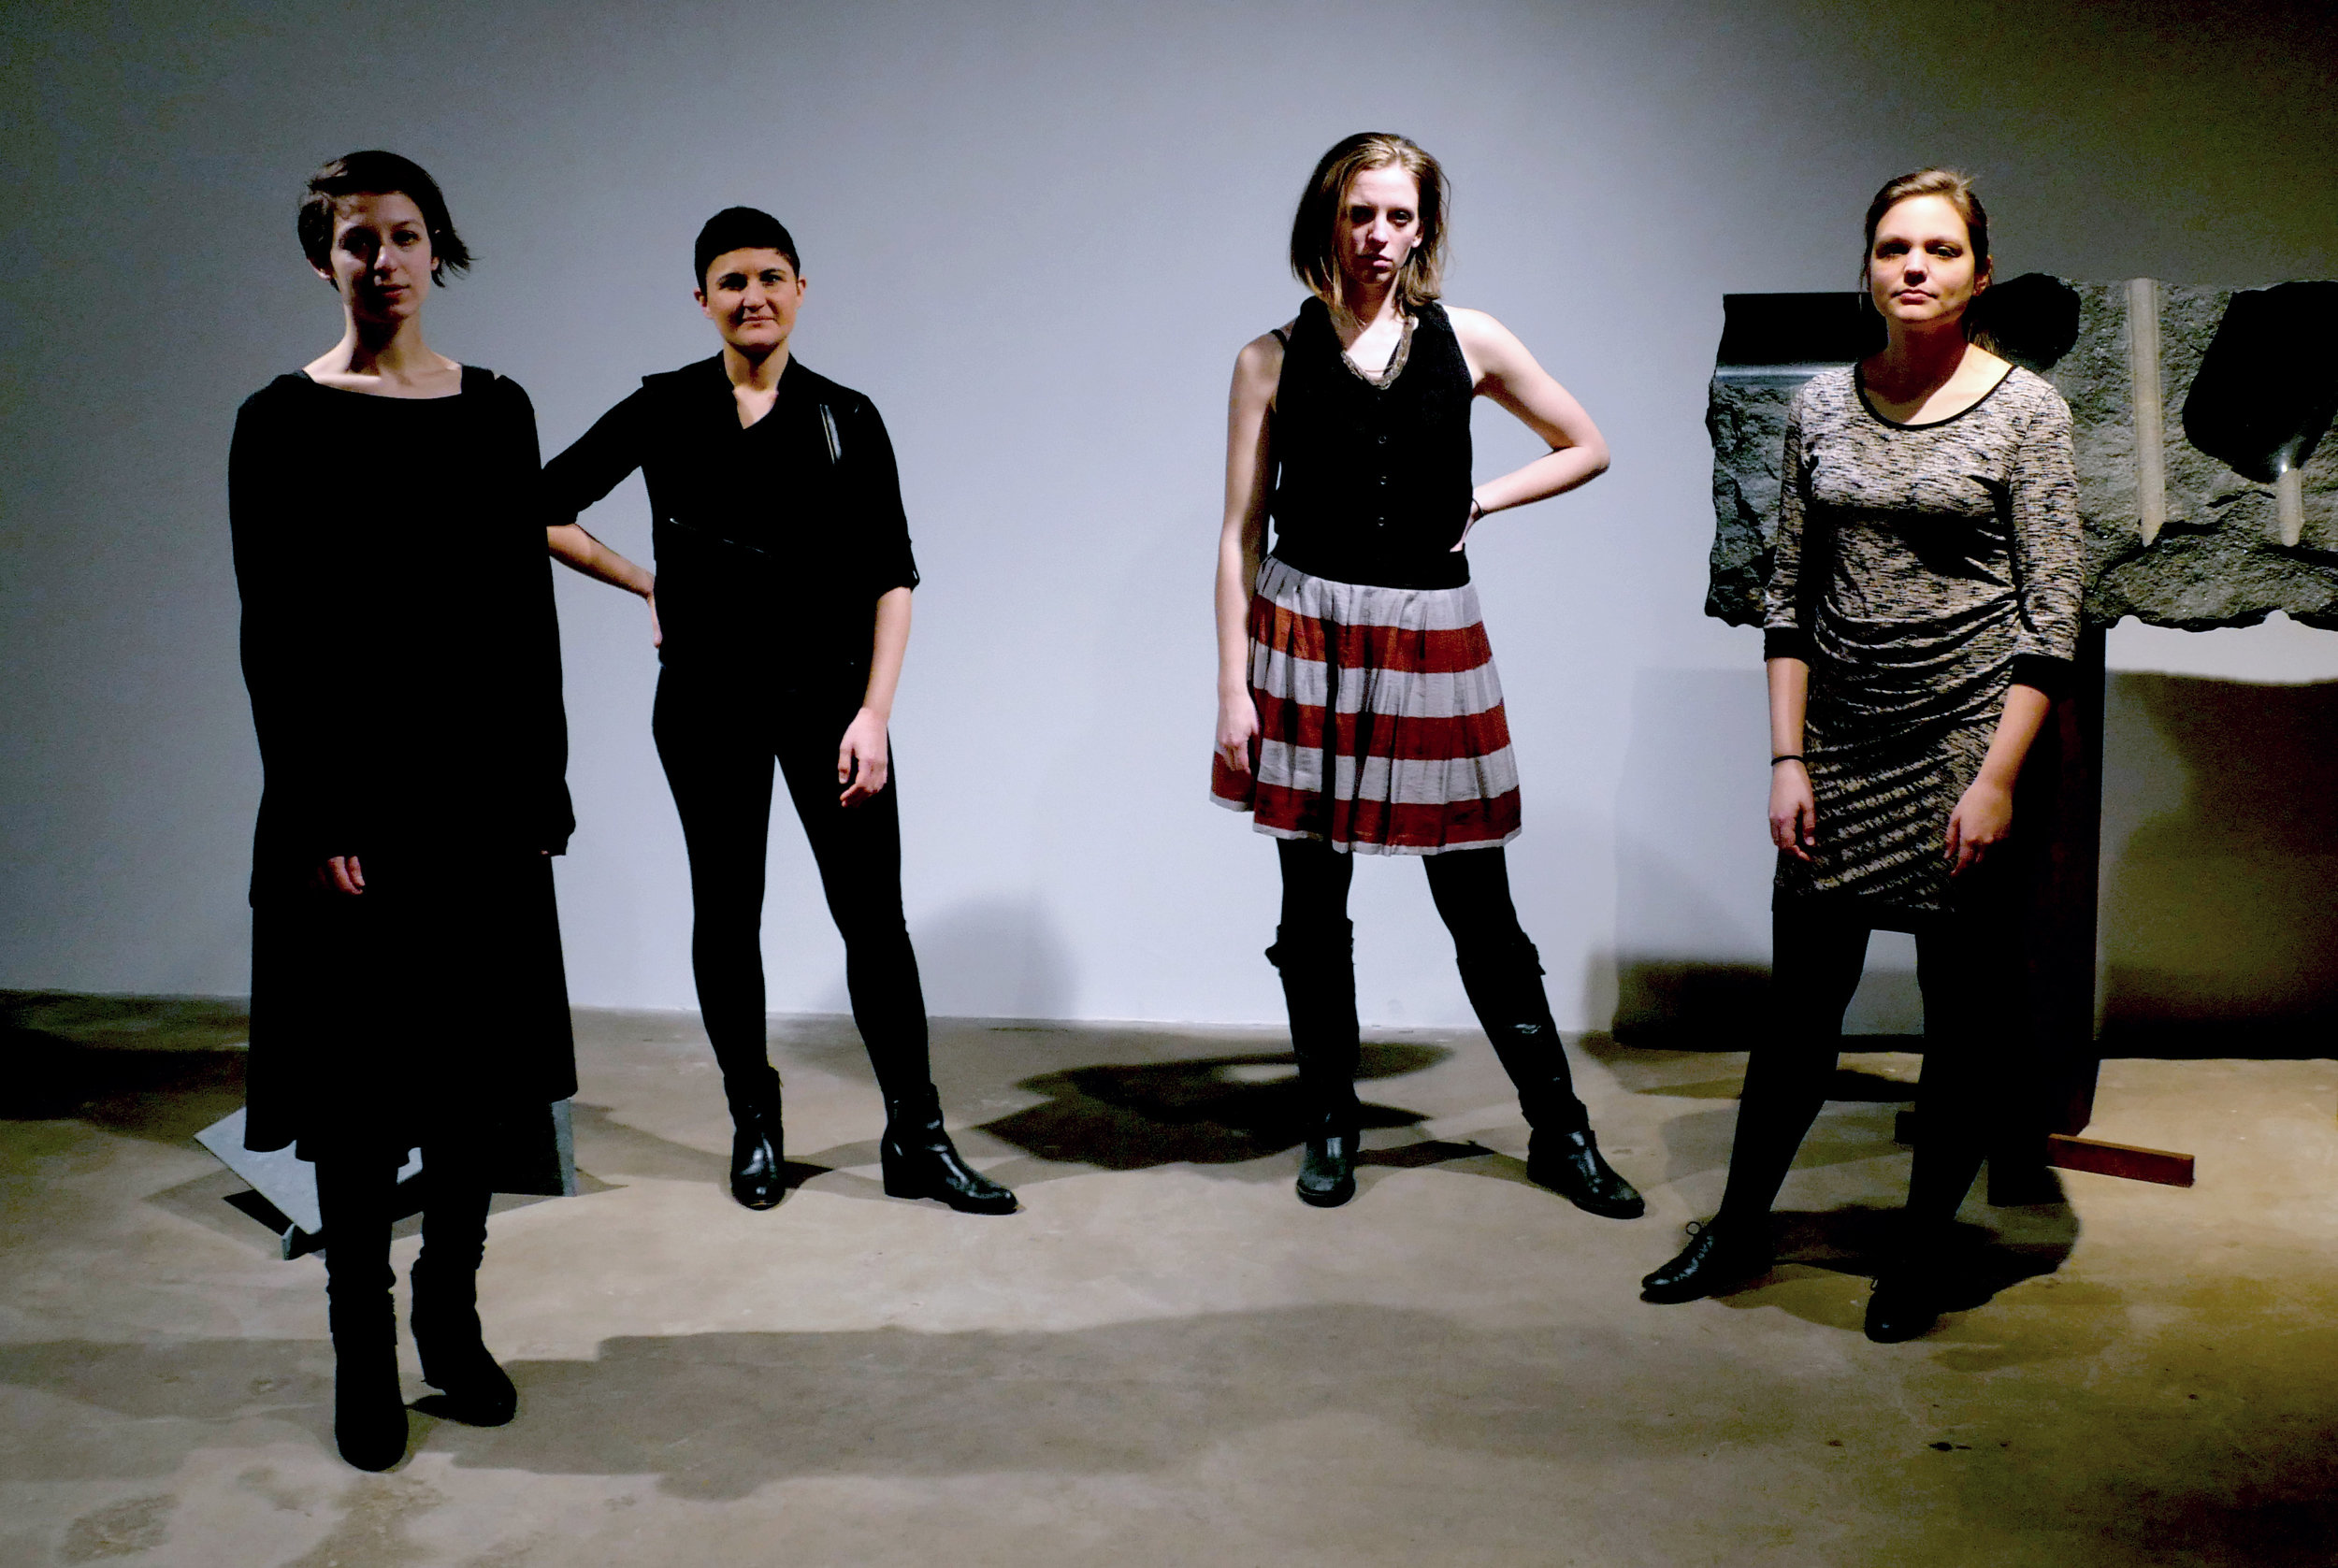 The Rhythm Method string quartet